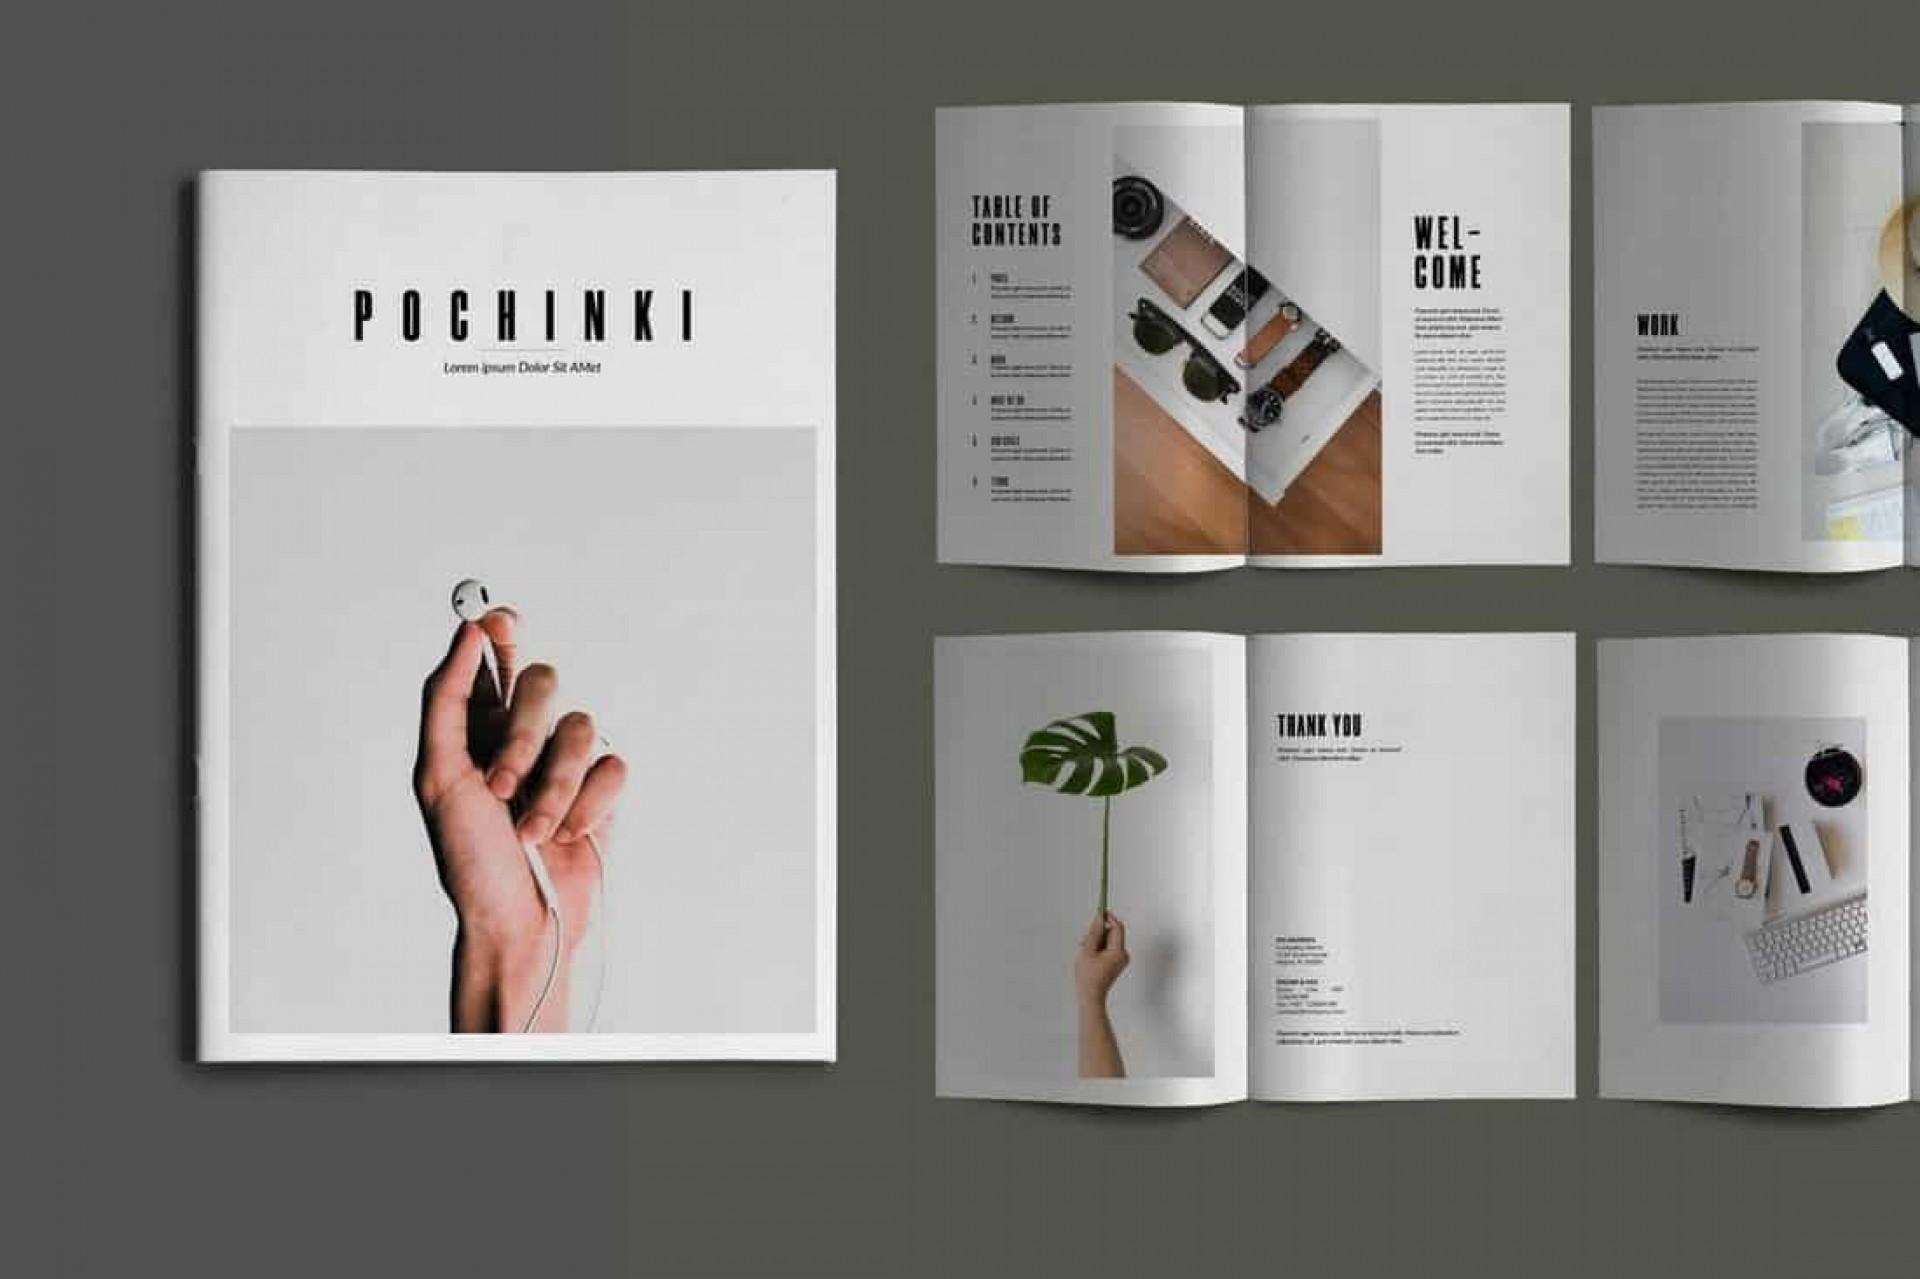 009 Magnificent Microsoft Publisher Booklet Template Idea  2007 Brochure Free Download Handbook1920